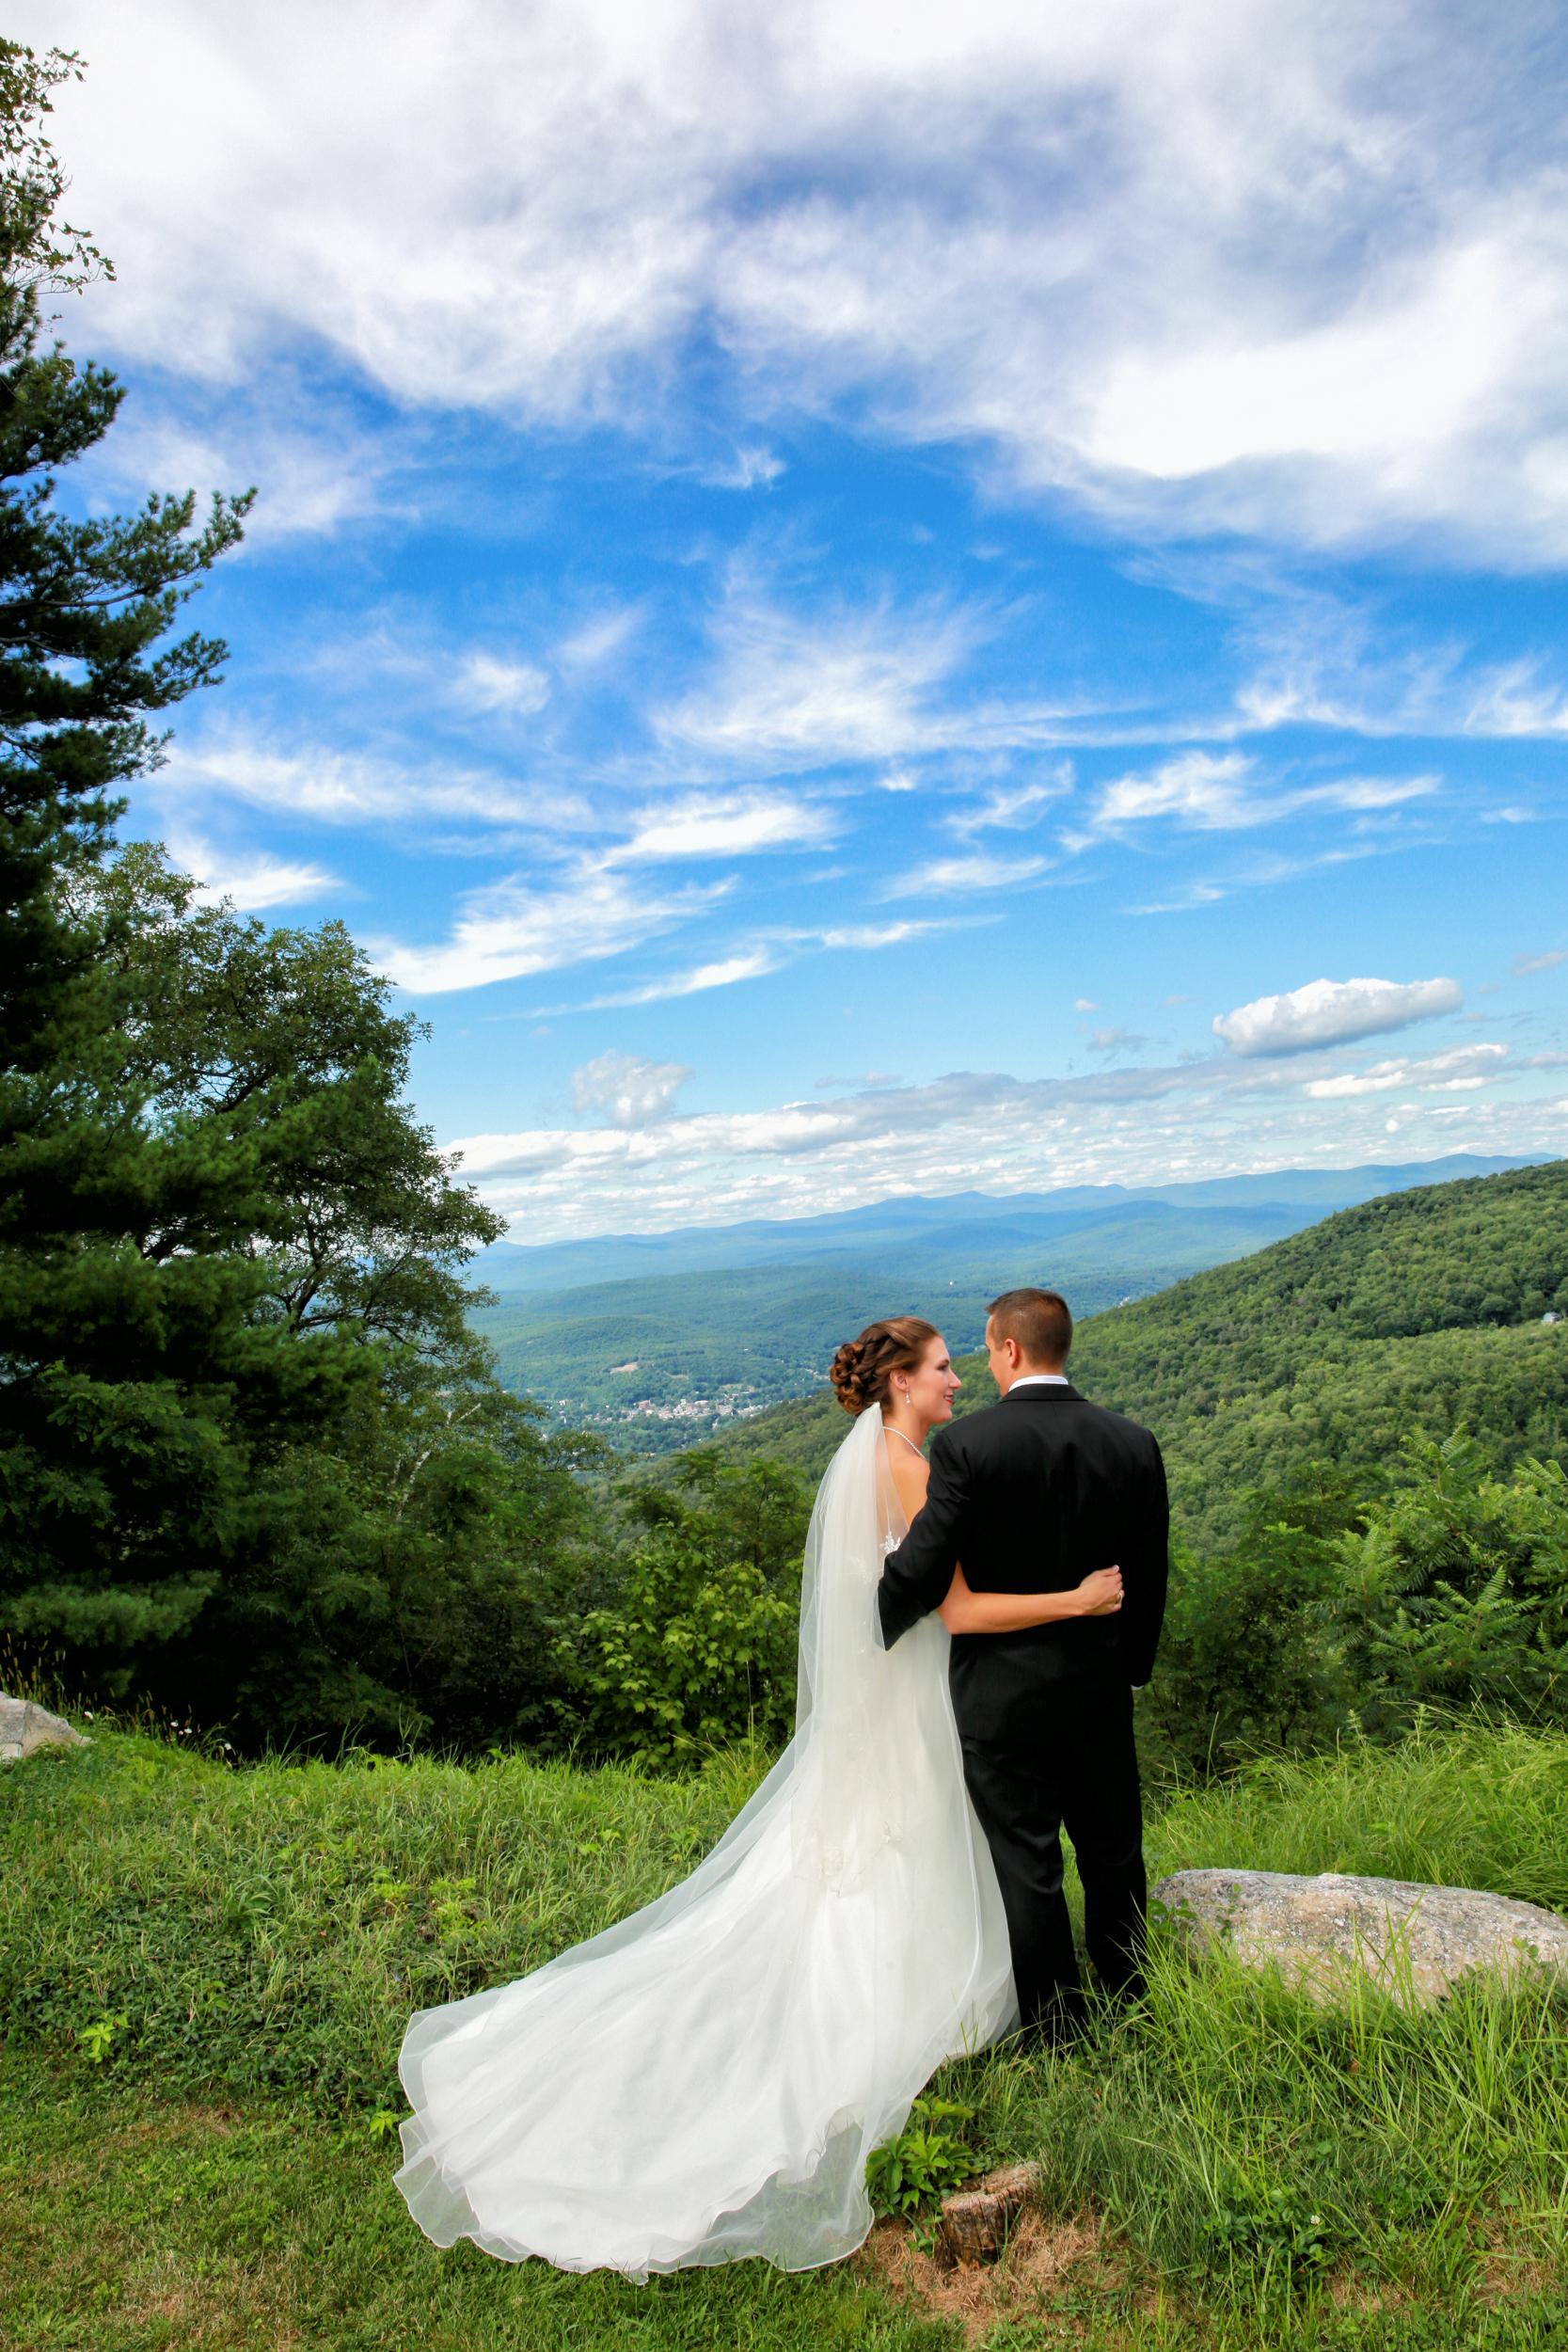 Wedding Photography near Mohonk Mountain House